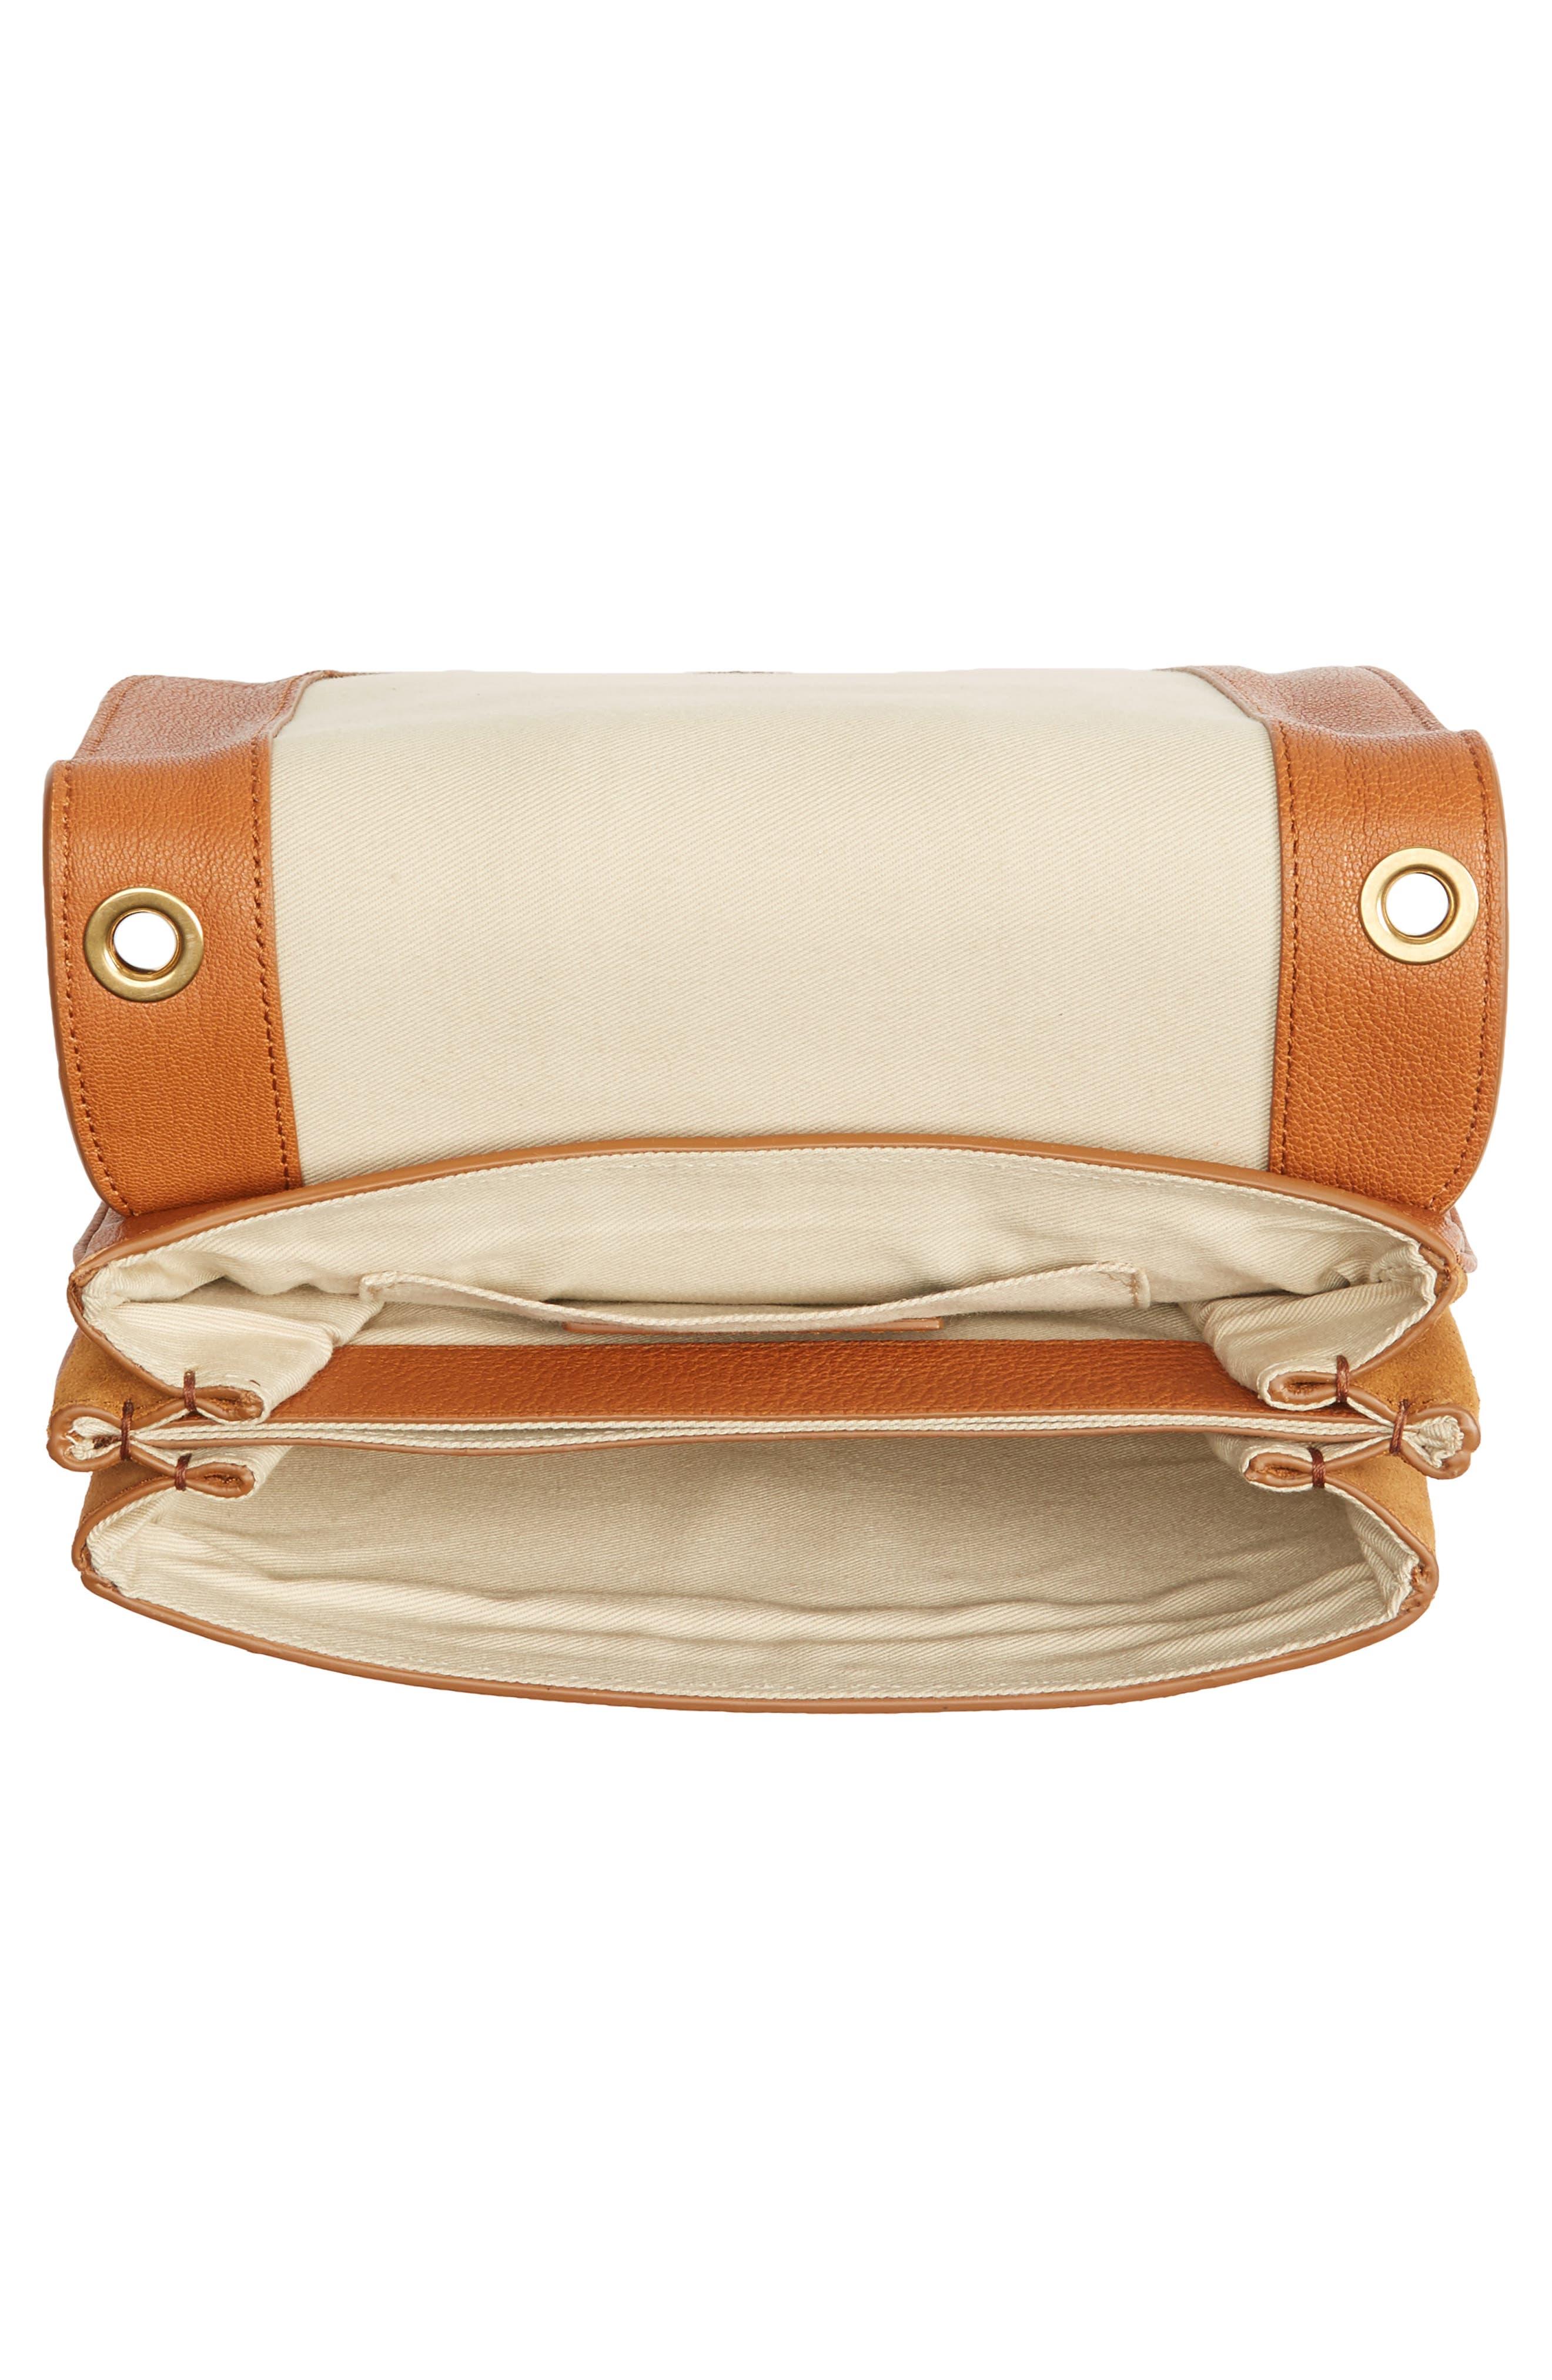 Hana Small Leather Crossbody Bag,                             Alternate thumbnail 21, color,